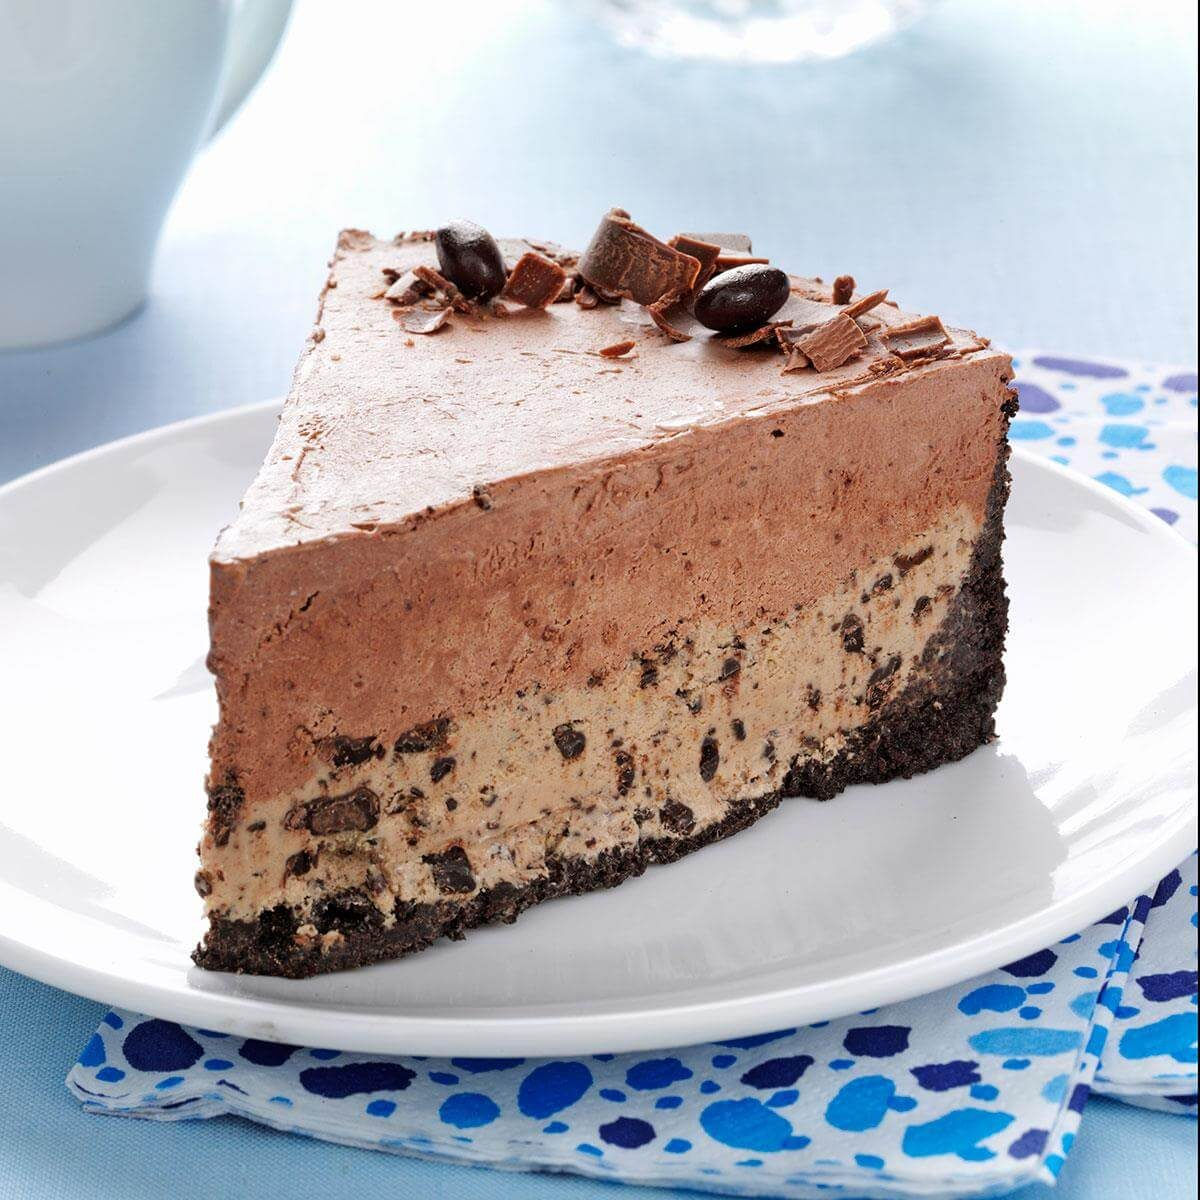 Chocolate-Coffee Bean Ice Cream Cake Recipe